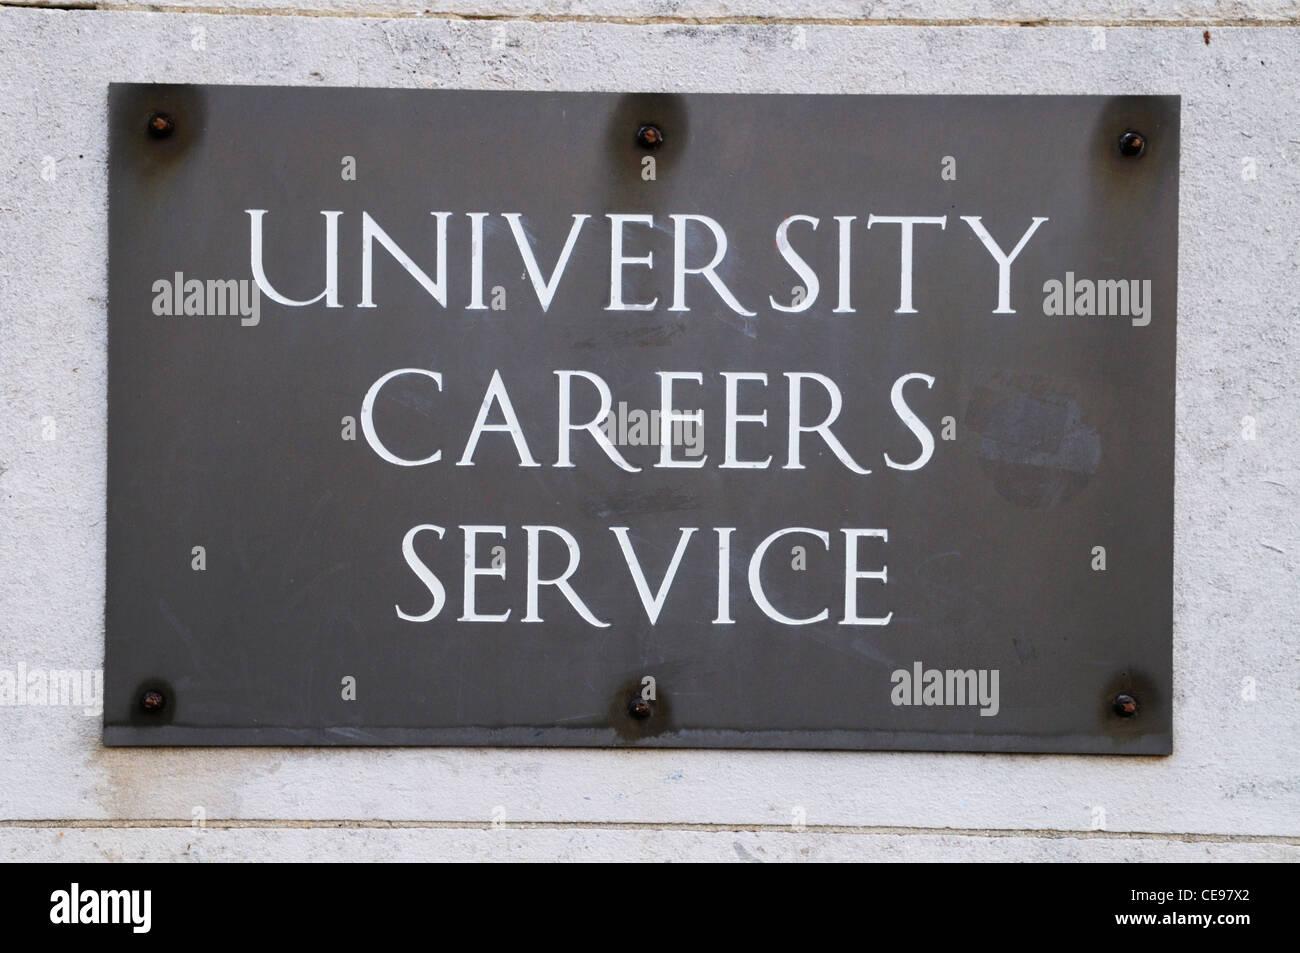 University Careers Service sign, Mill Lane, Cambridge, England, UK Stock Photo